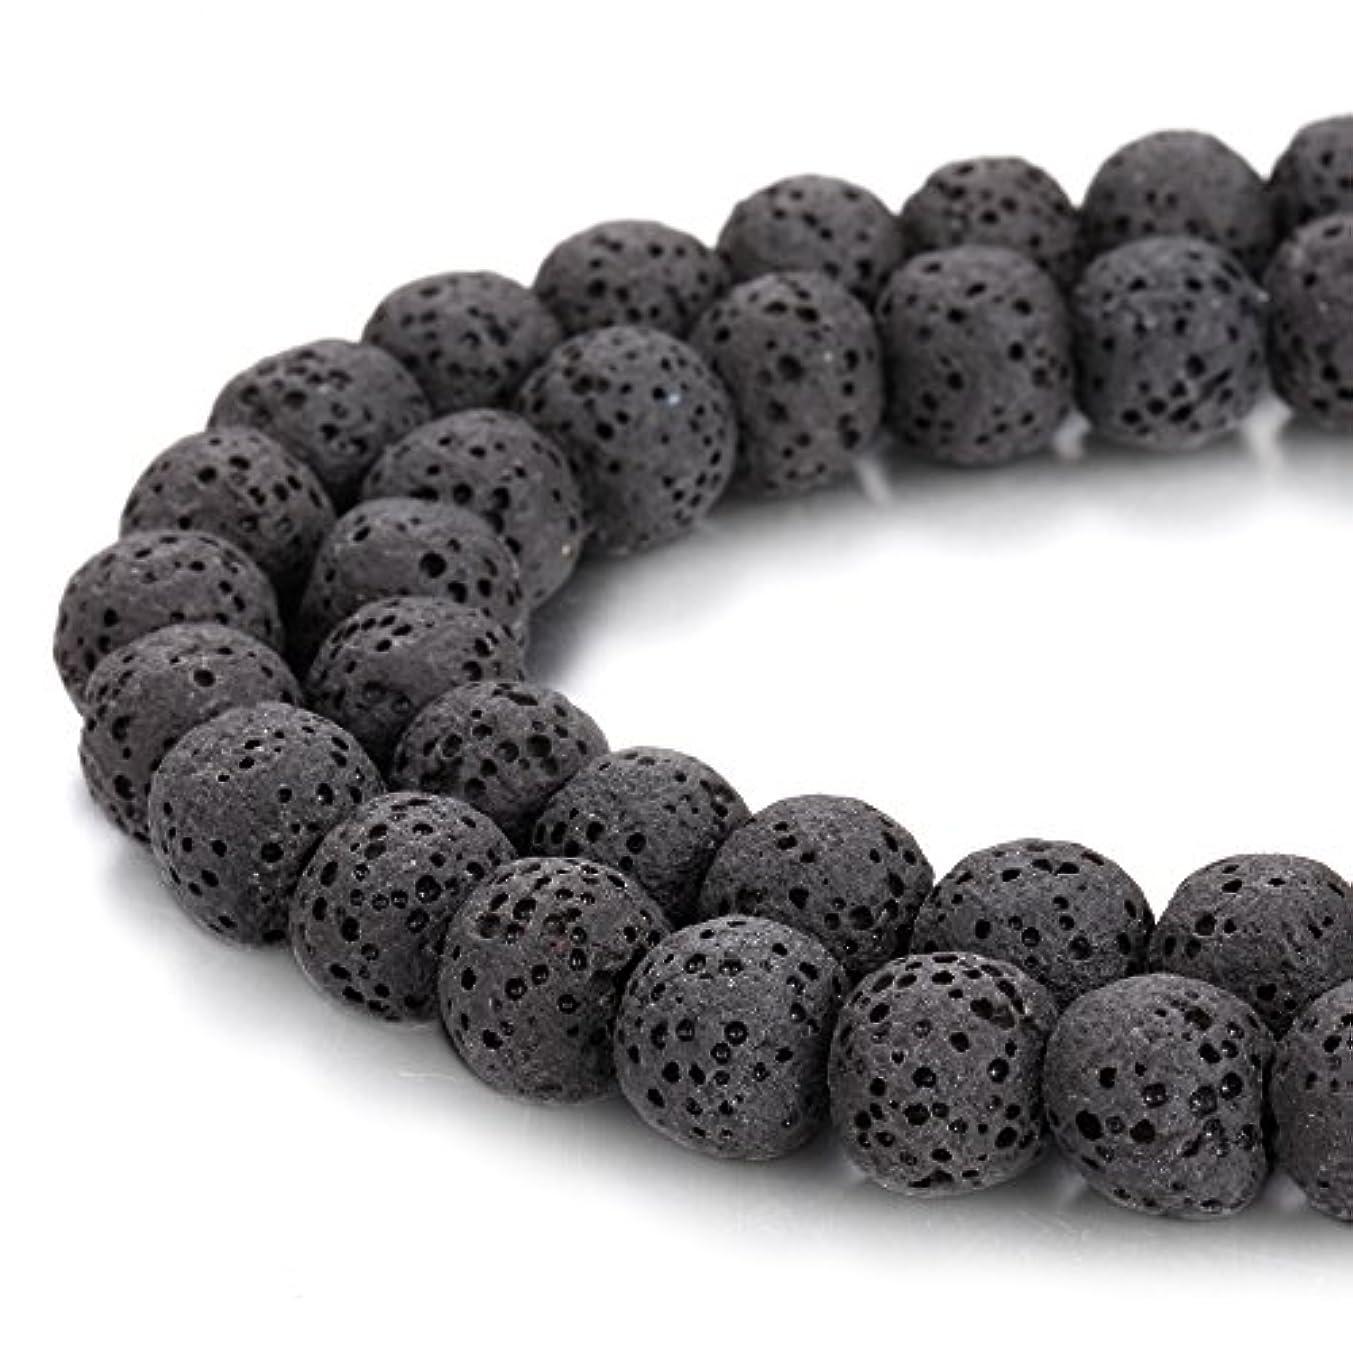 BORUO Natural 10mm Black Color Lava Rock Stone Semi Precious Gemstone Round Loose Beads Energy Stone Healing Power for Jewelry Making (Approxi 38pcs per strand)